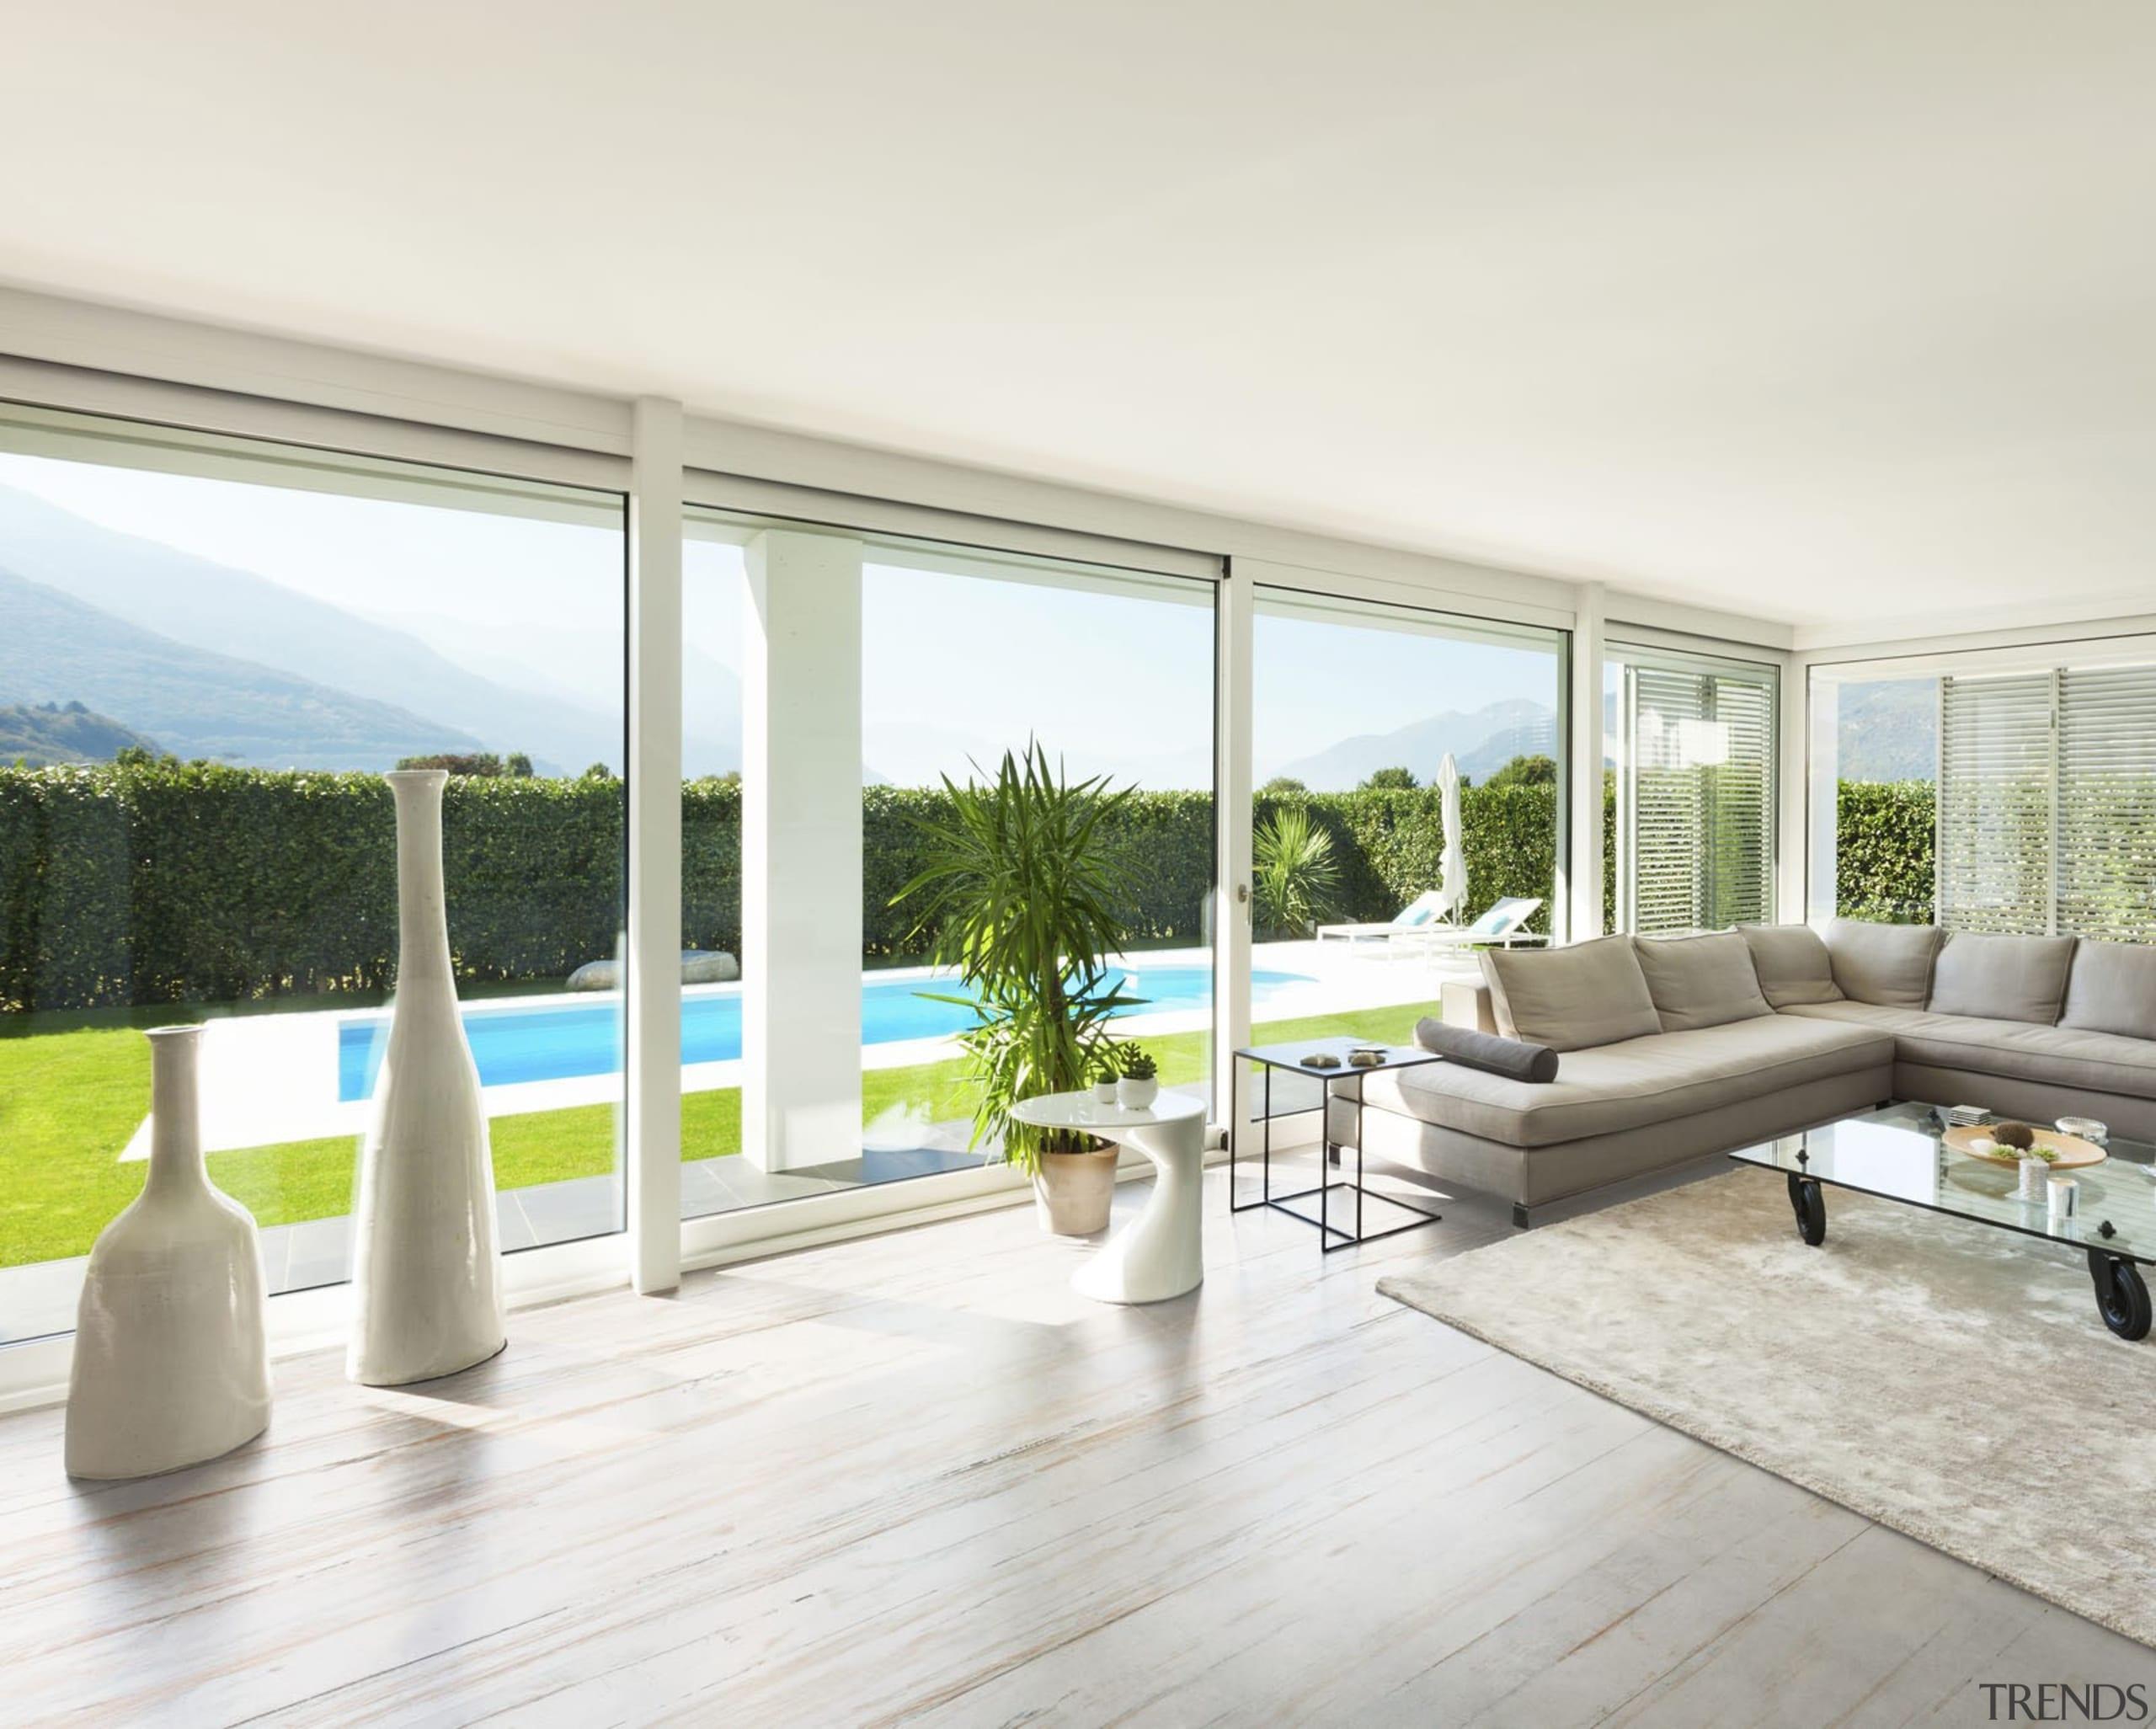 Dekton Makai Zemin - Dekton Makai Zemin - floor, flooring, house, interior design, living room, property, real estate, window, white